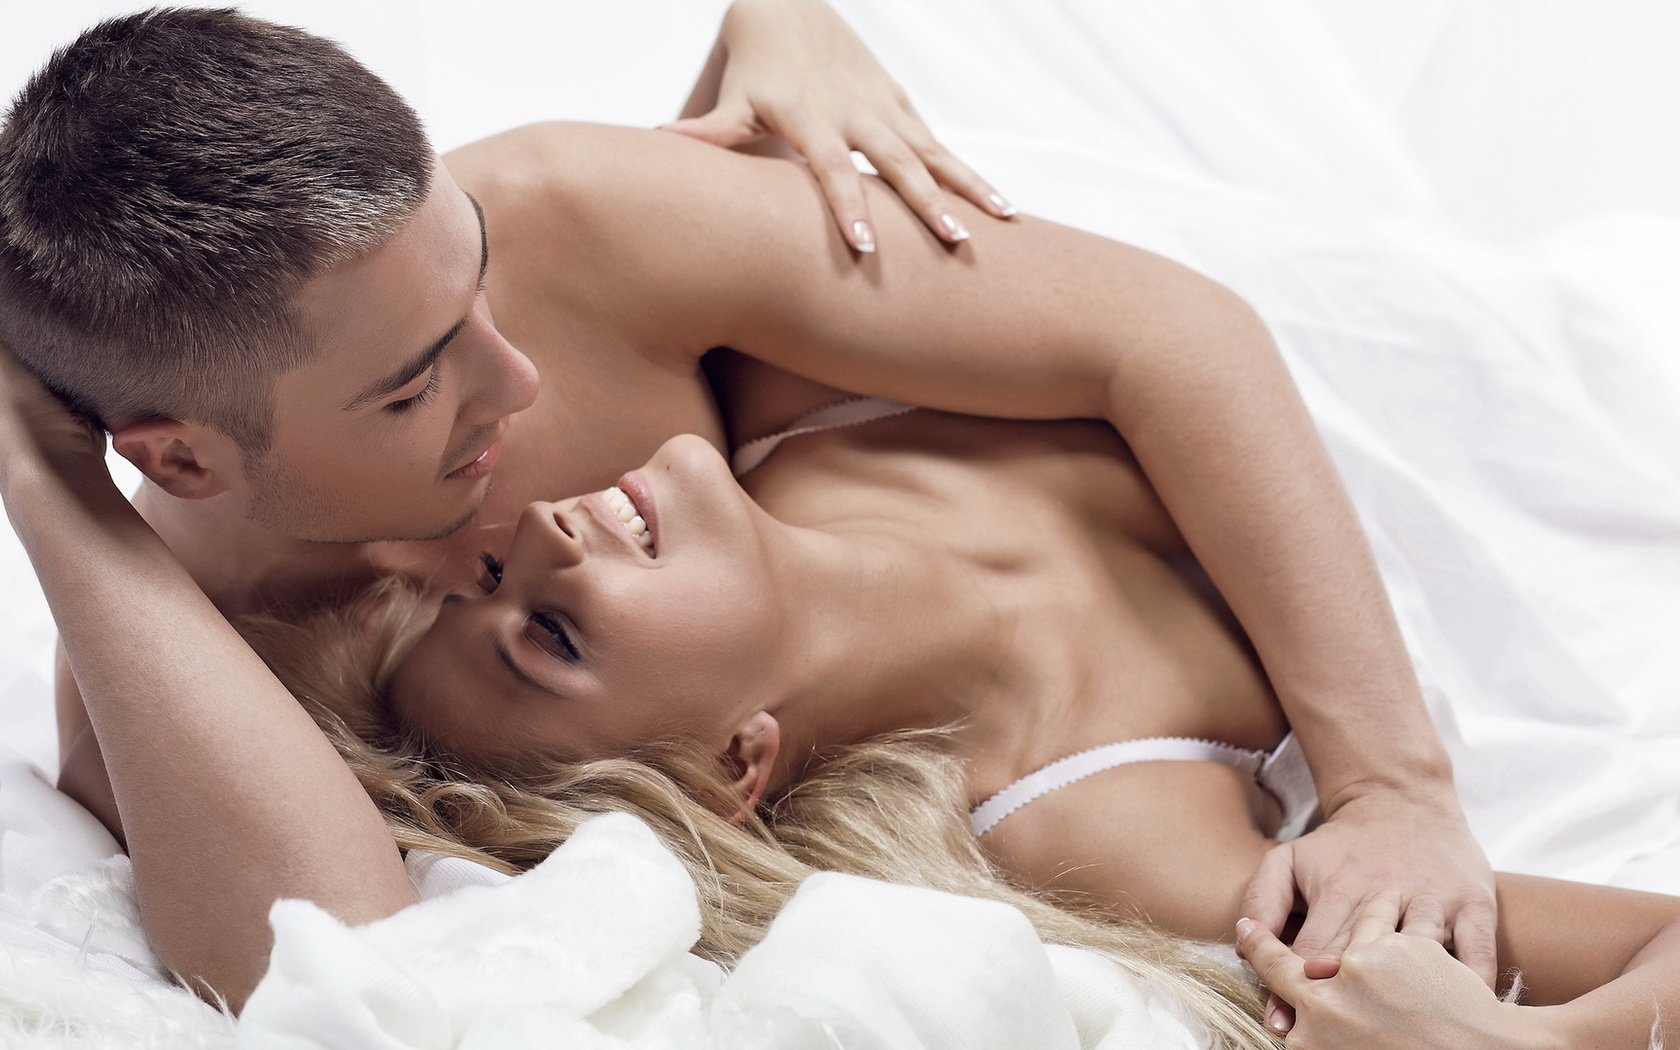 nikulina-filmi-seks-paren-i-devushka-fotki